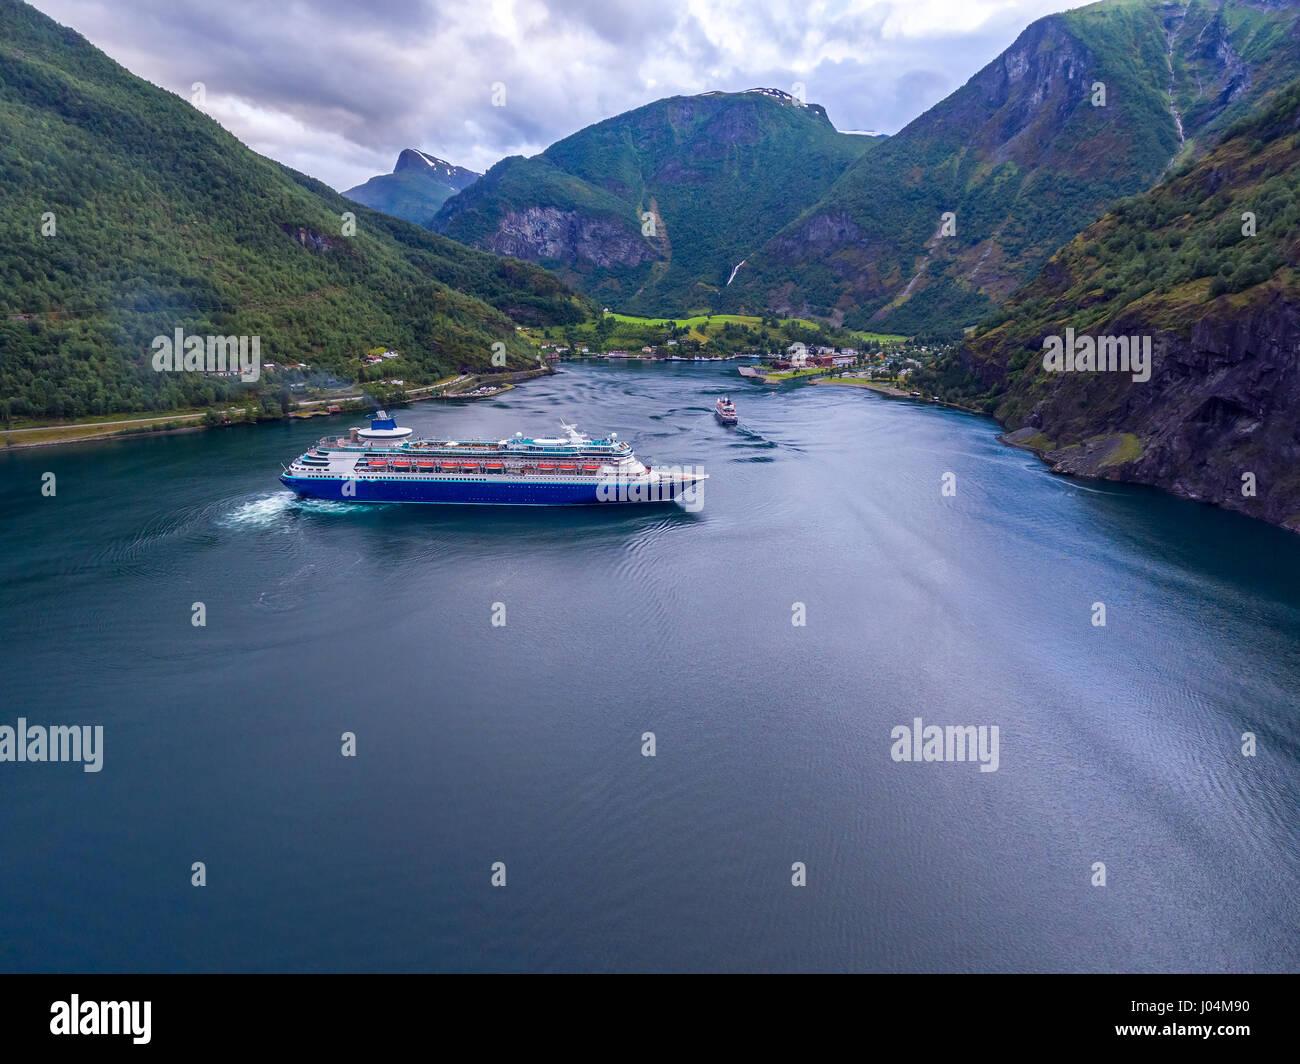 Kreuzfahrt Schiff, Kreuzfahrt-Liner am Sognefjord oder Sognefjorden, Luftaufnahmen Flam Norwegen Stockbild